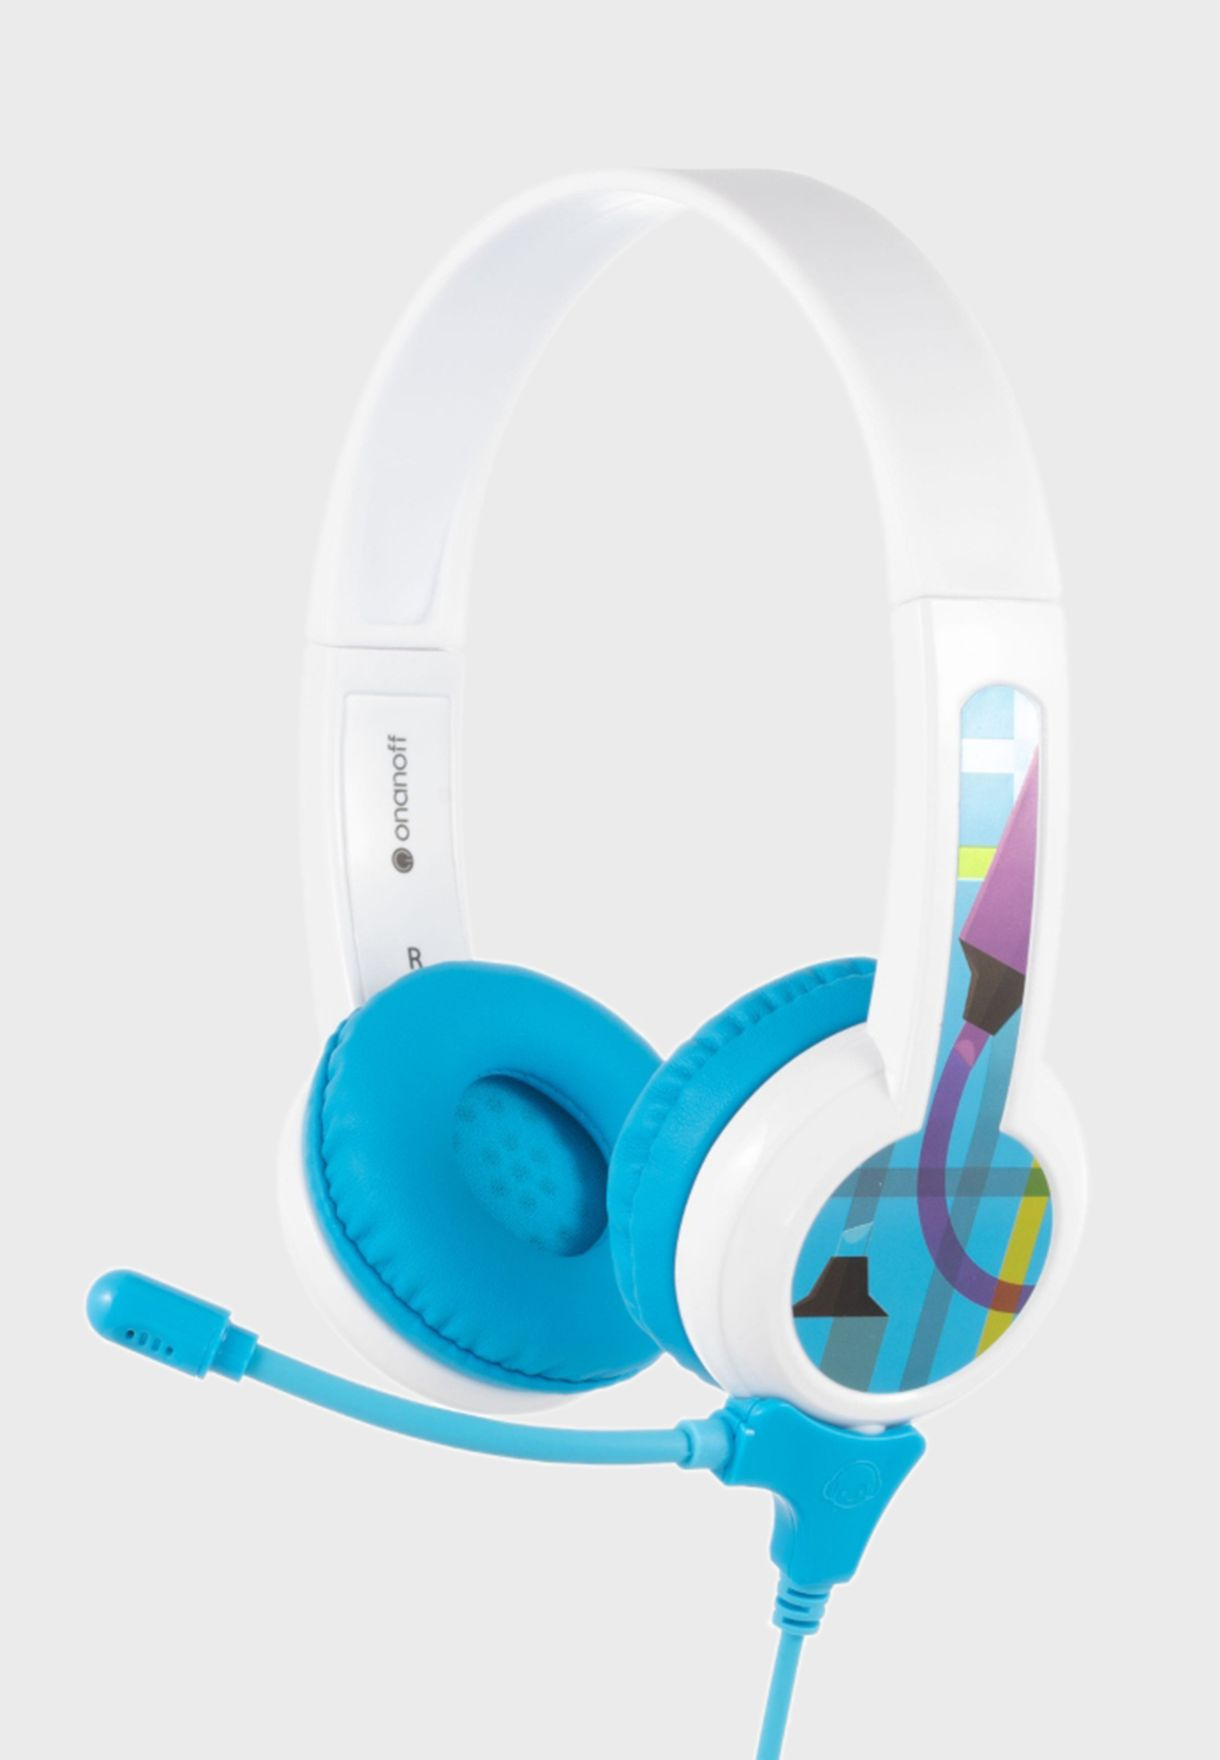 Studybuddy Wireless Headphone With Mic